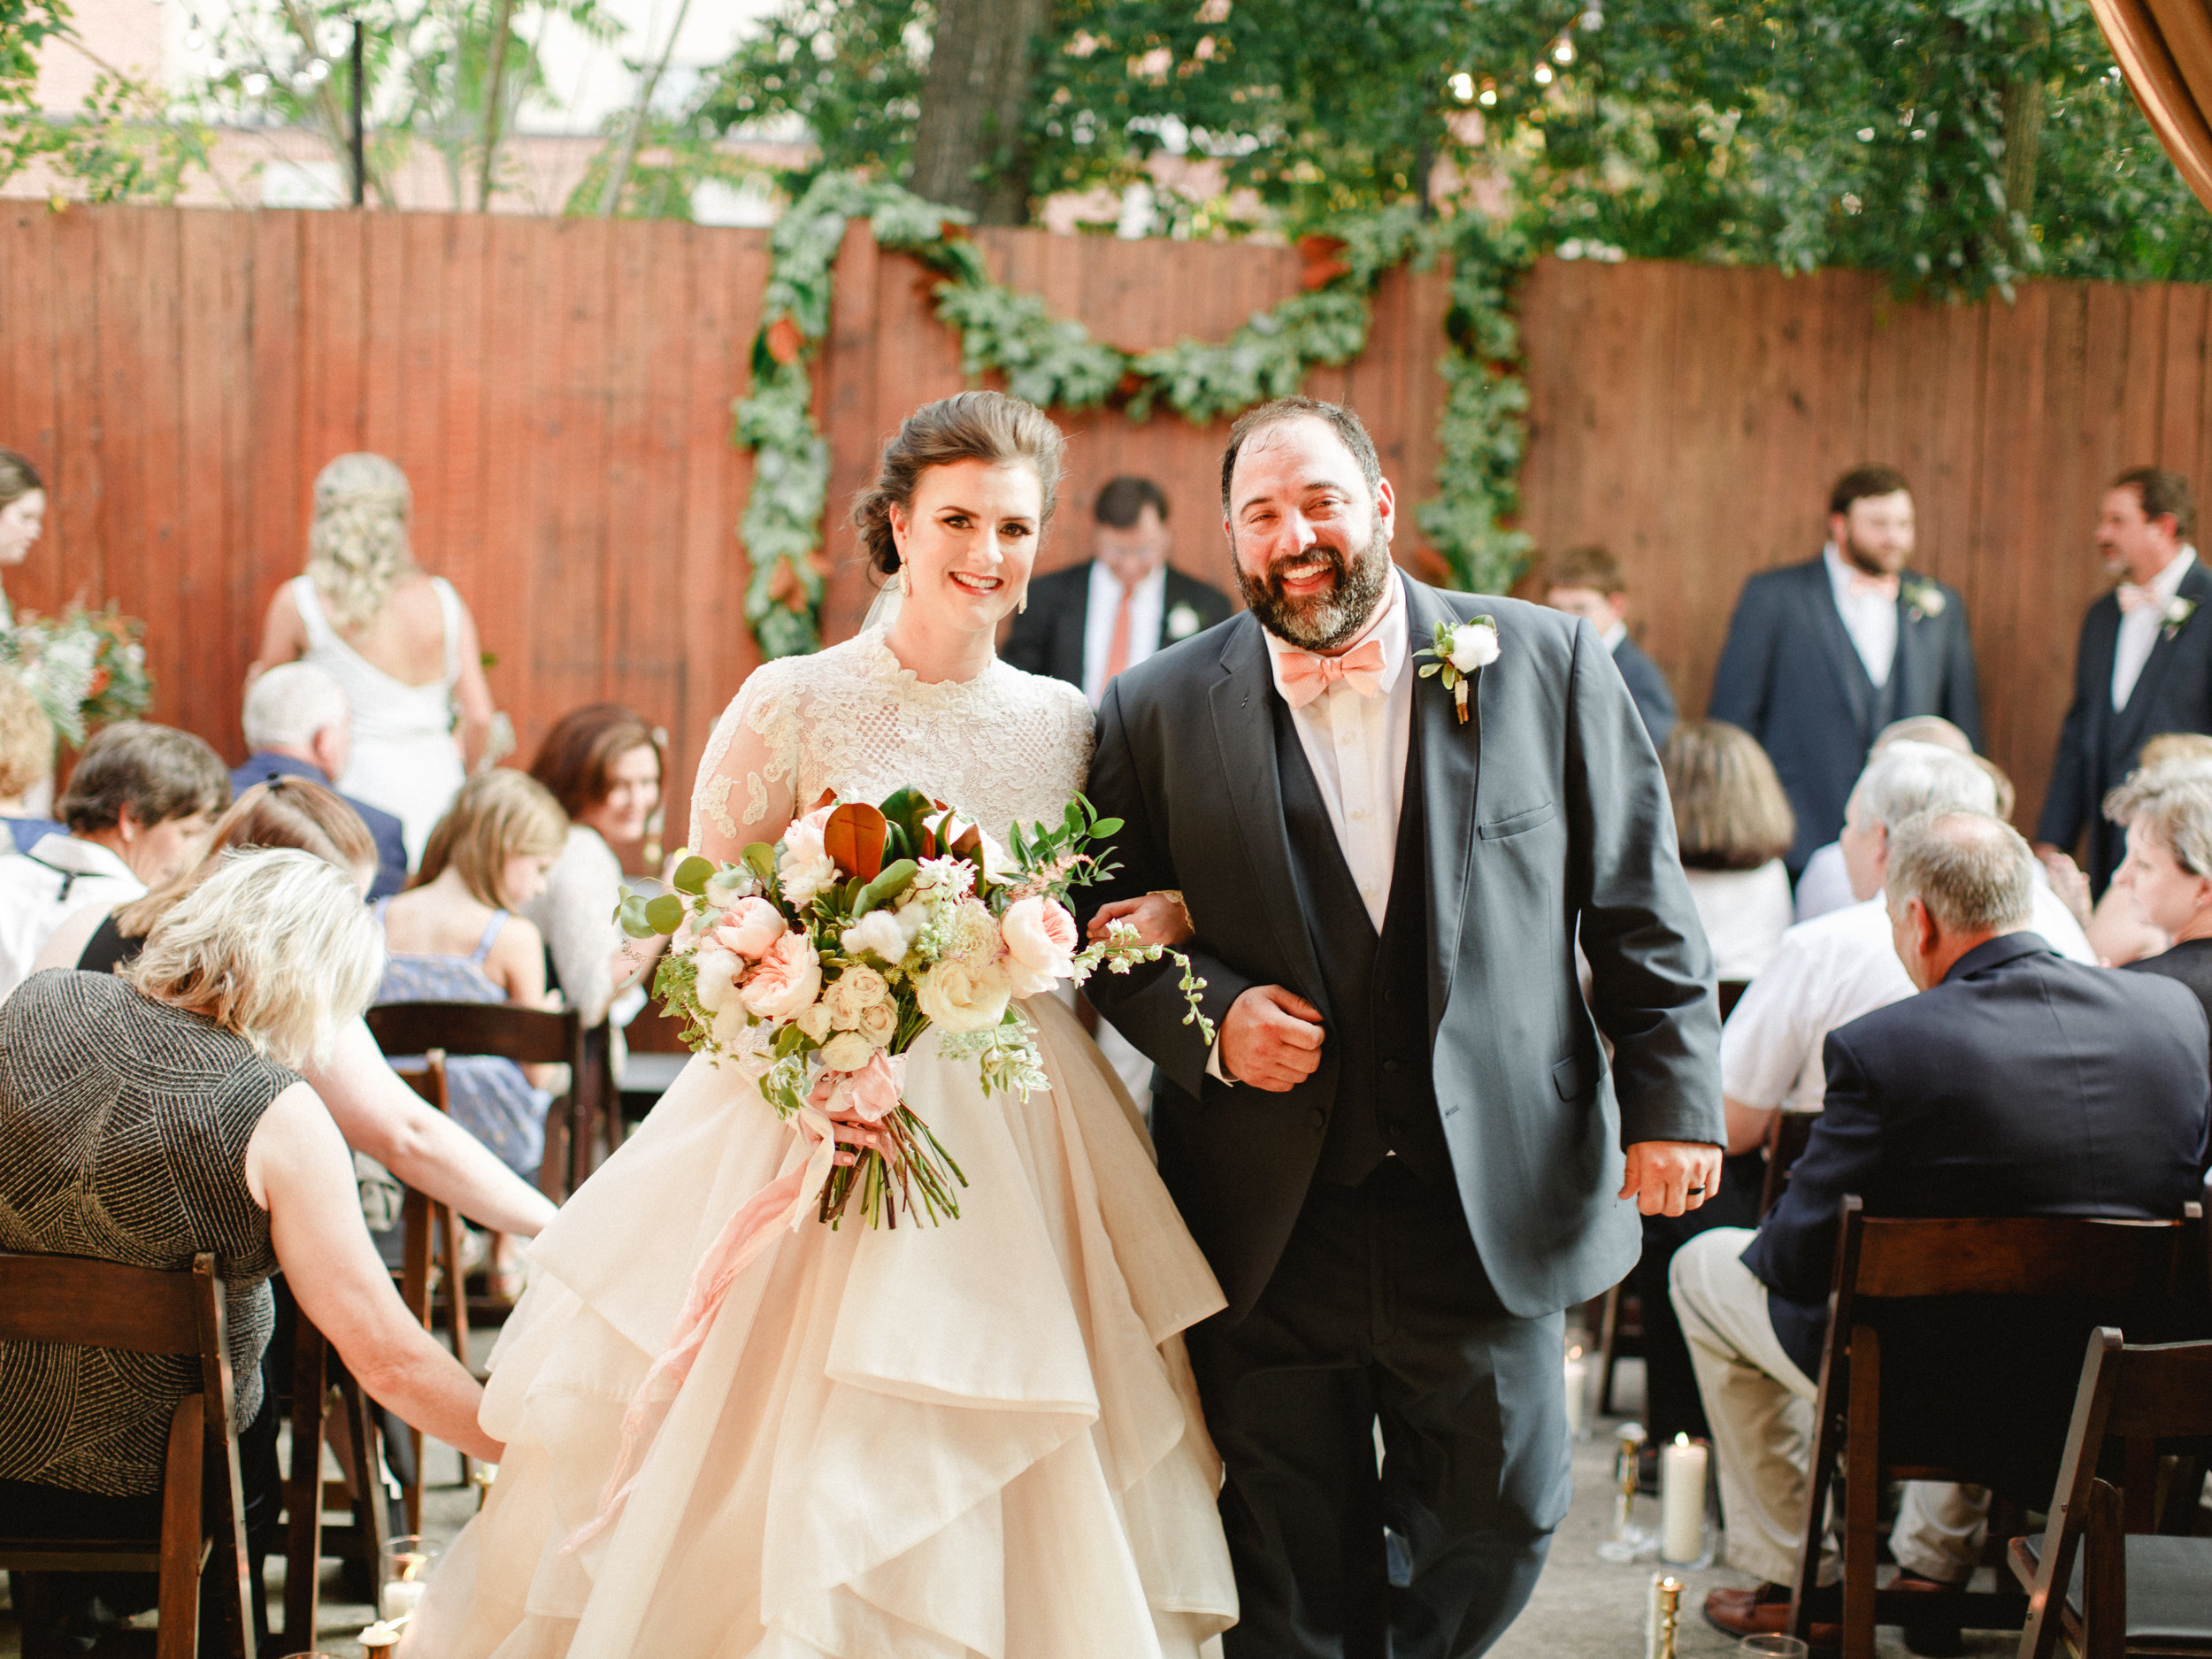 savannah-cha-bella-wedding-22.jpg